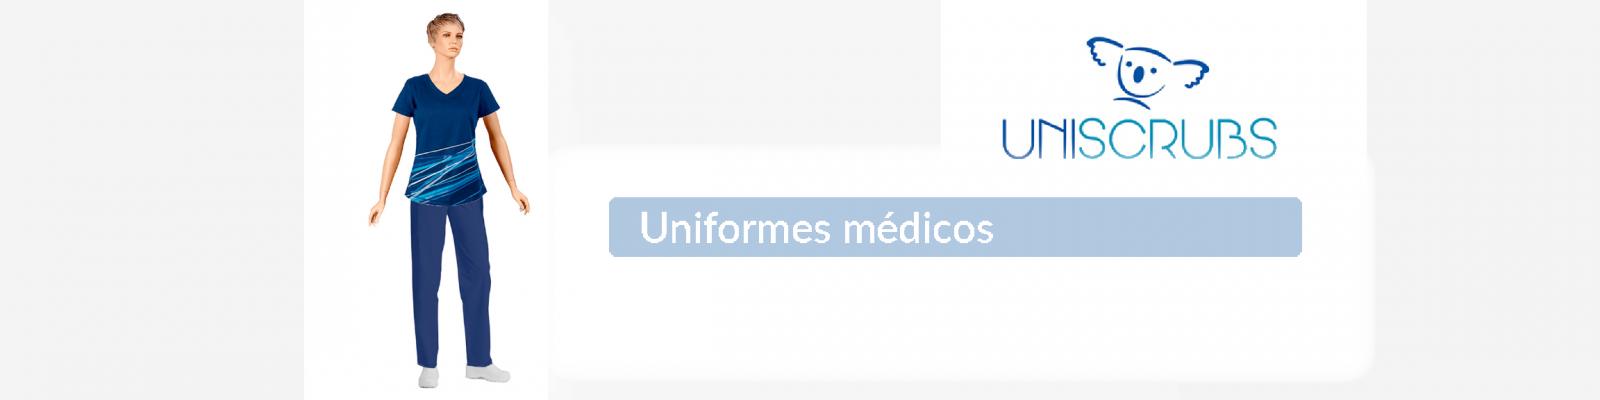 Uniscrubs portada-Uniformes